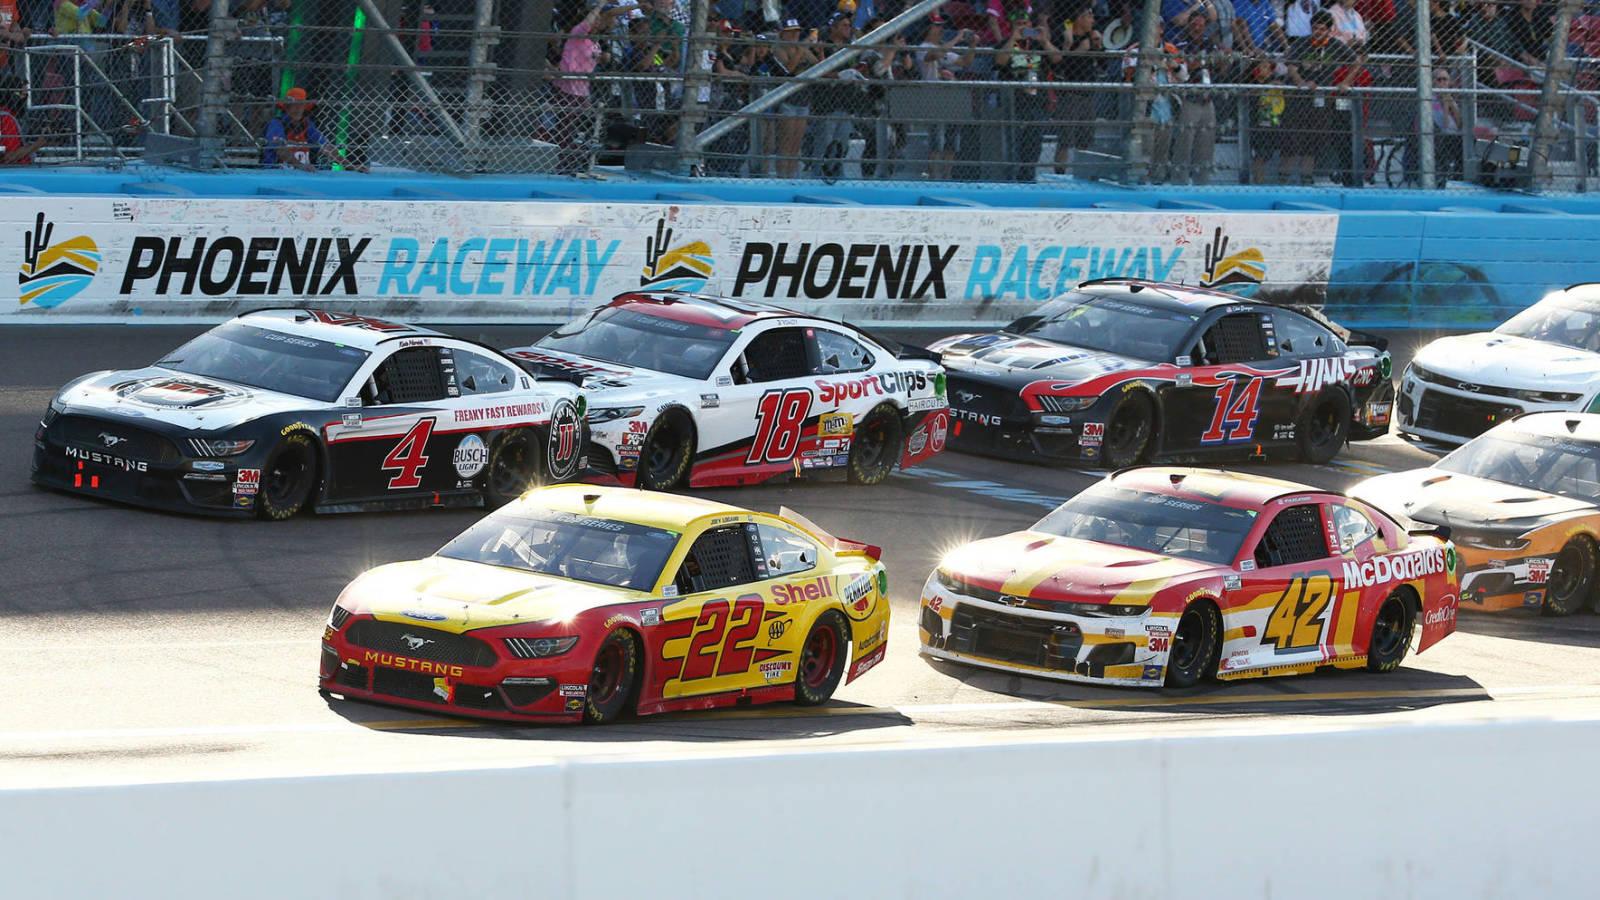 Sports world embraces NASCAR putting on virtual race on FS1